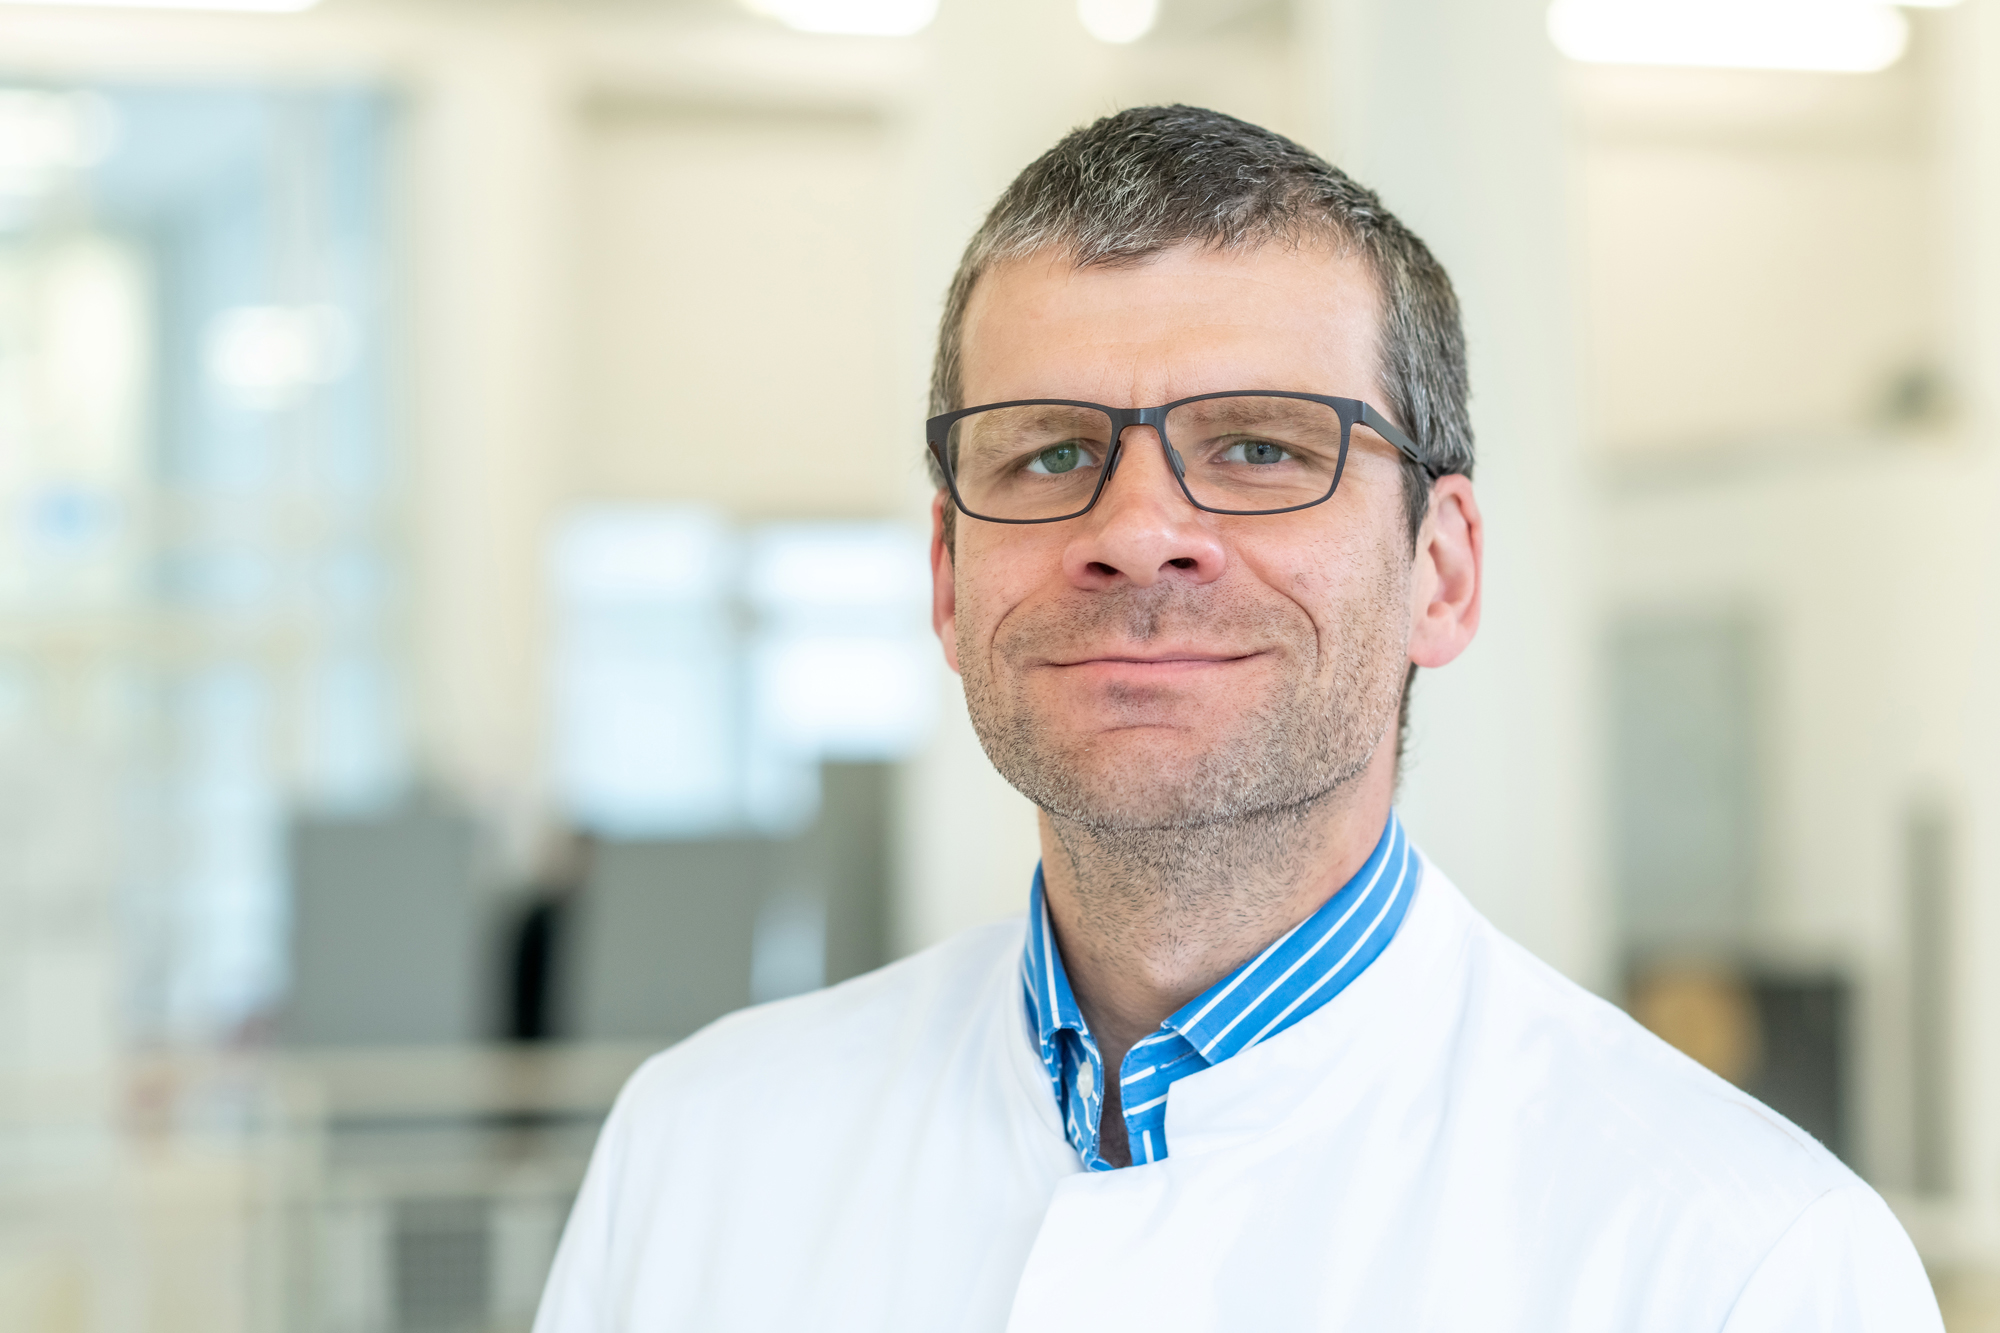 PD Dr. med. Bastian von Tresckow